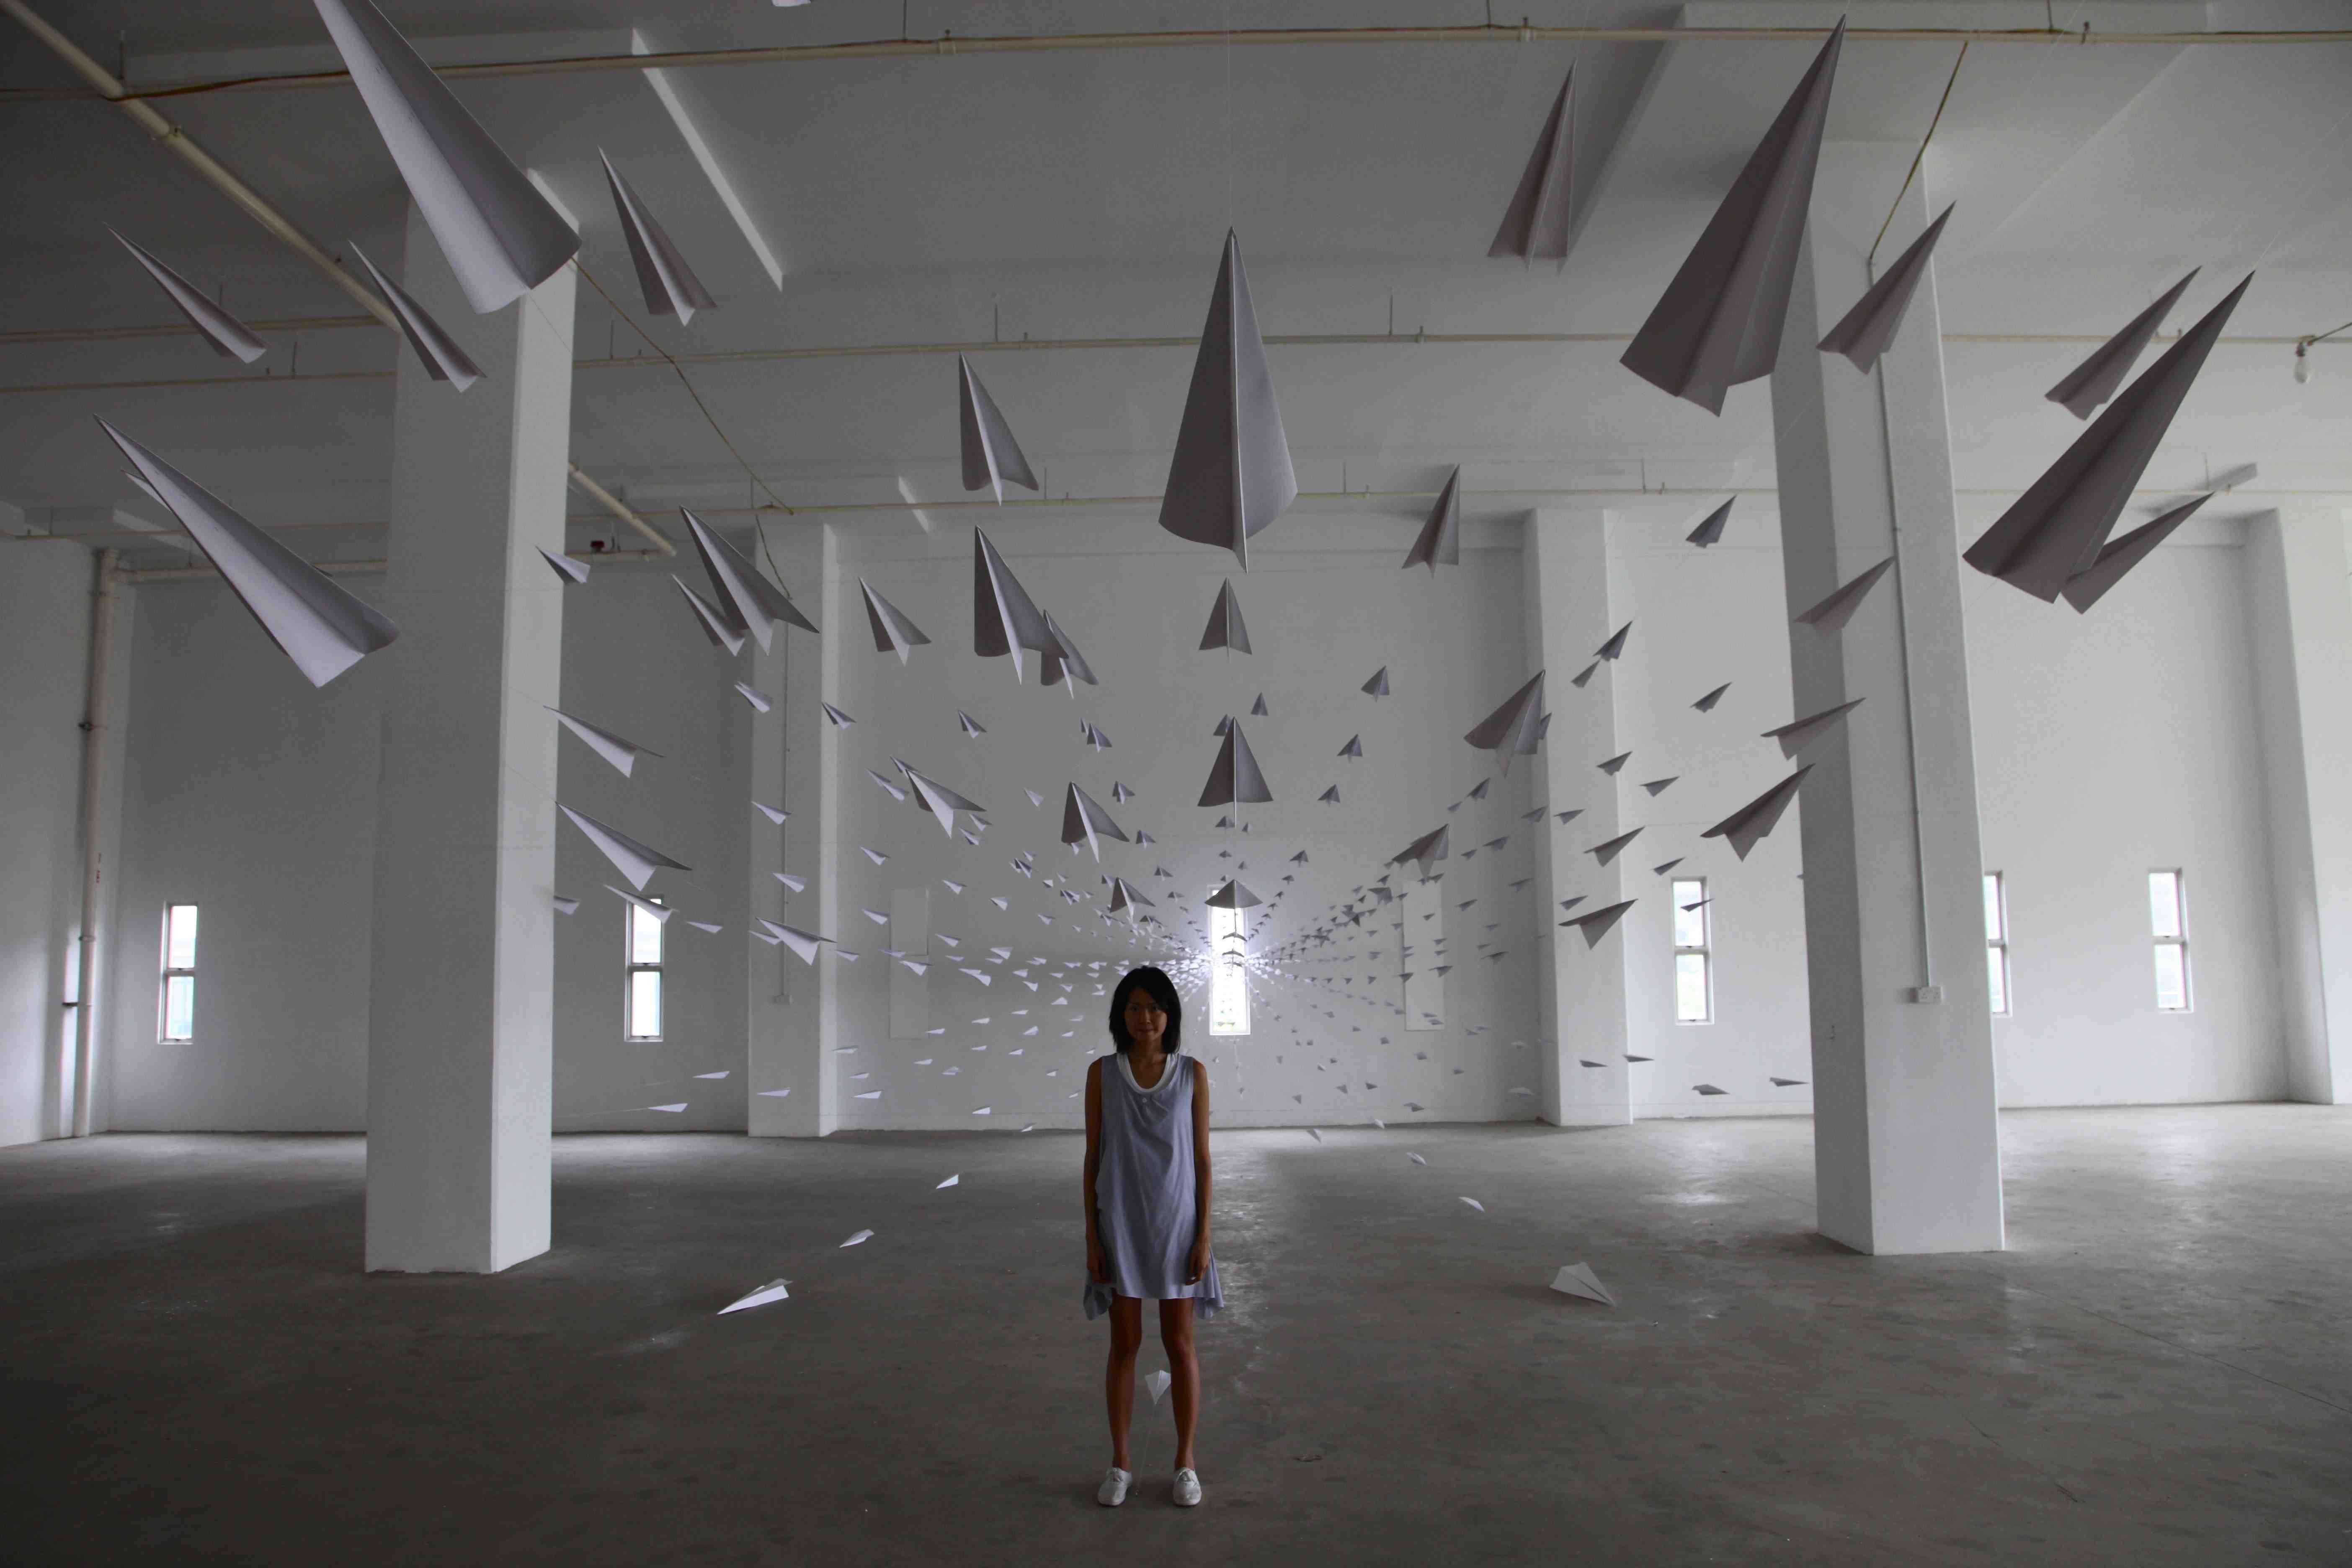 installation art | Kloset Kase Blog